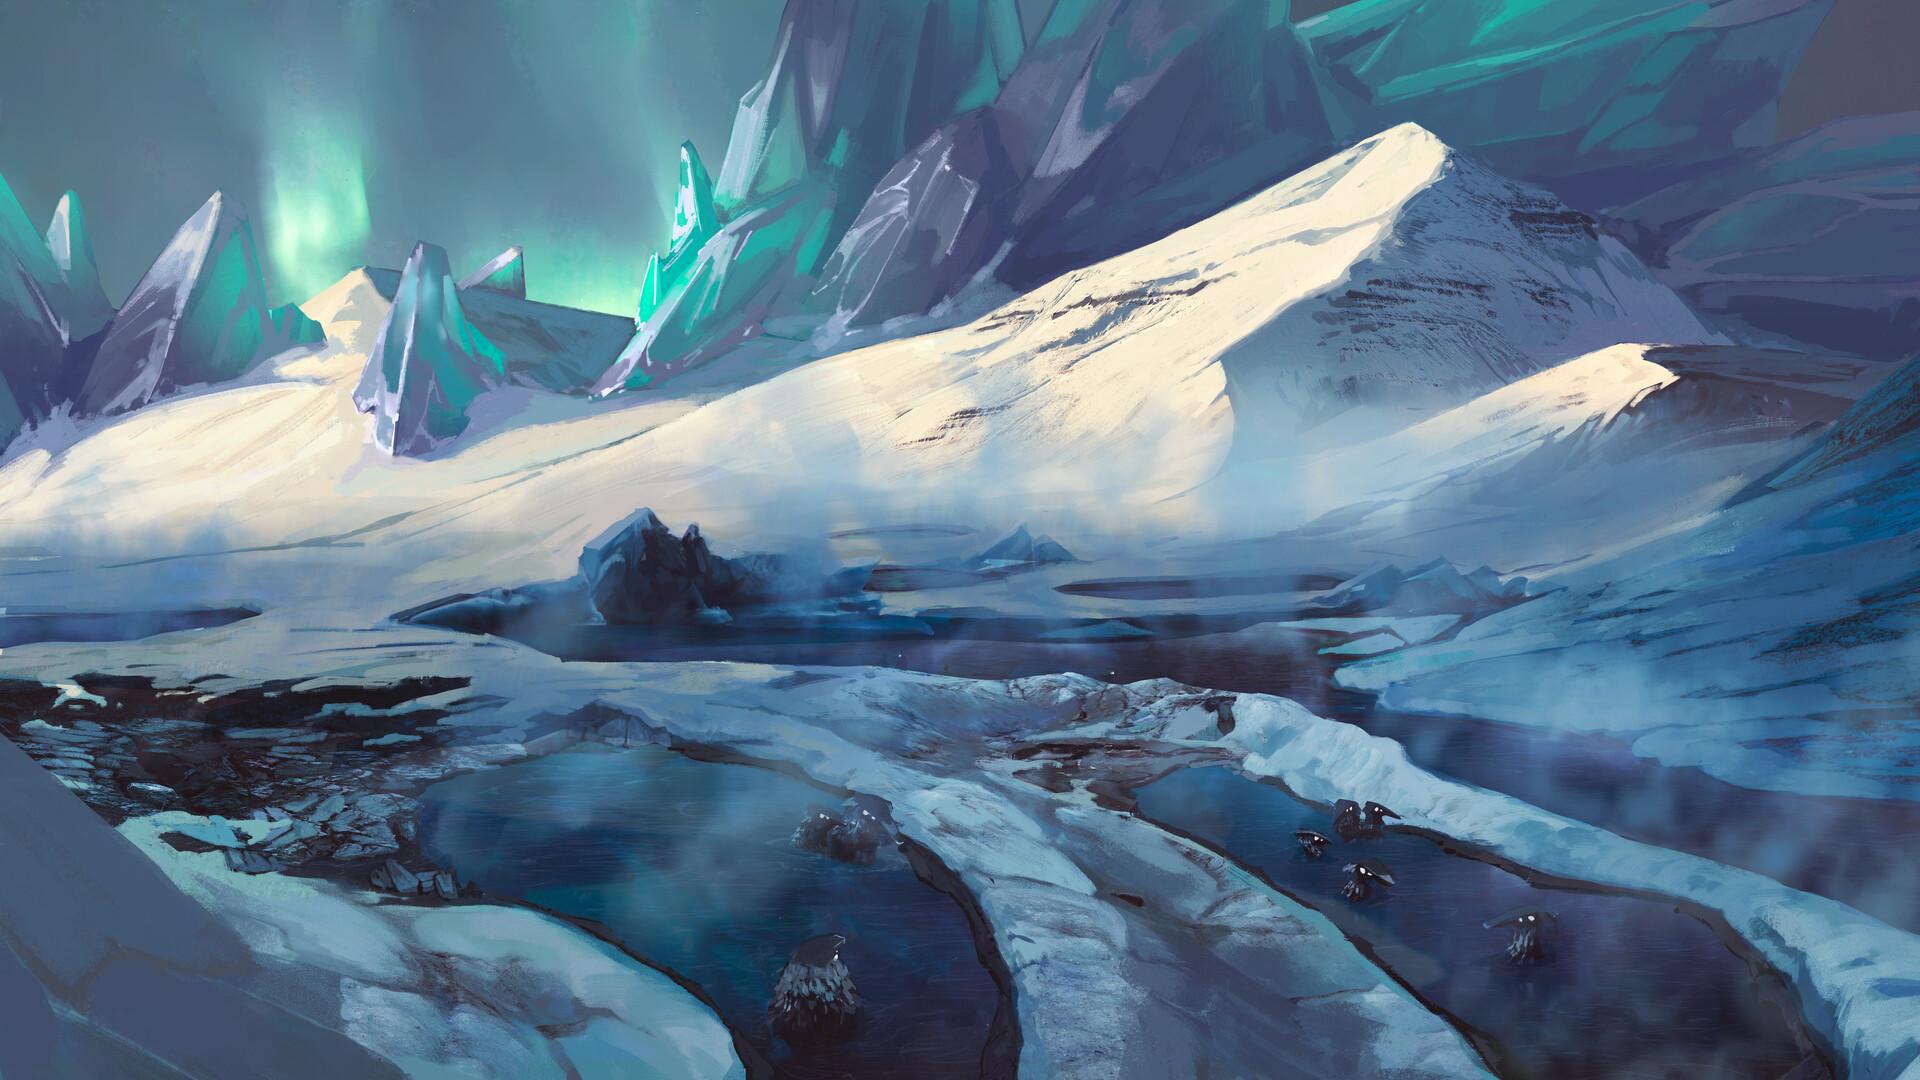 Ice oasis